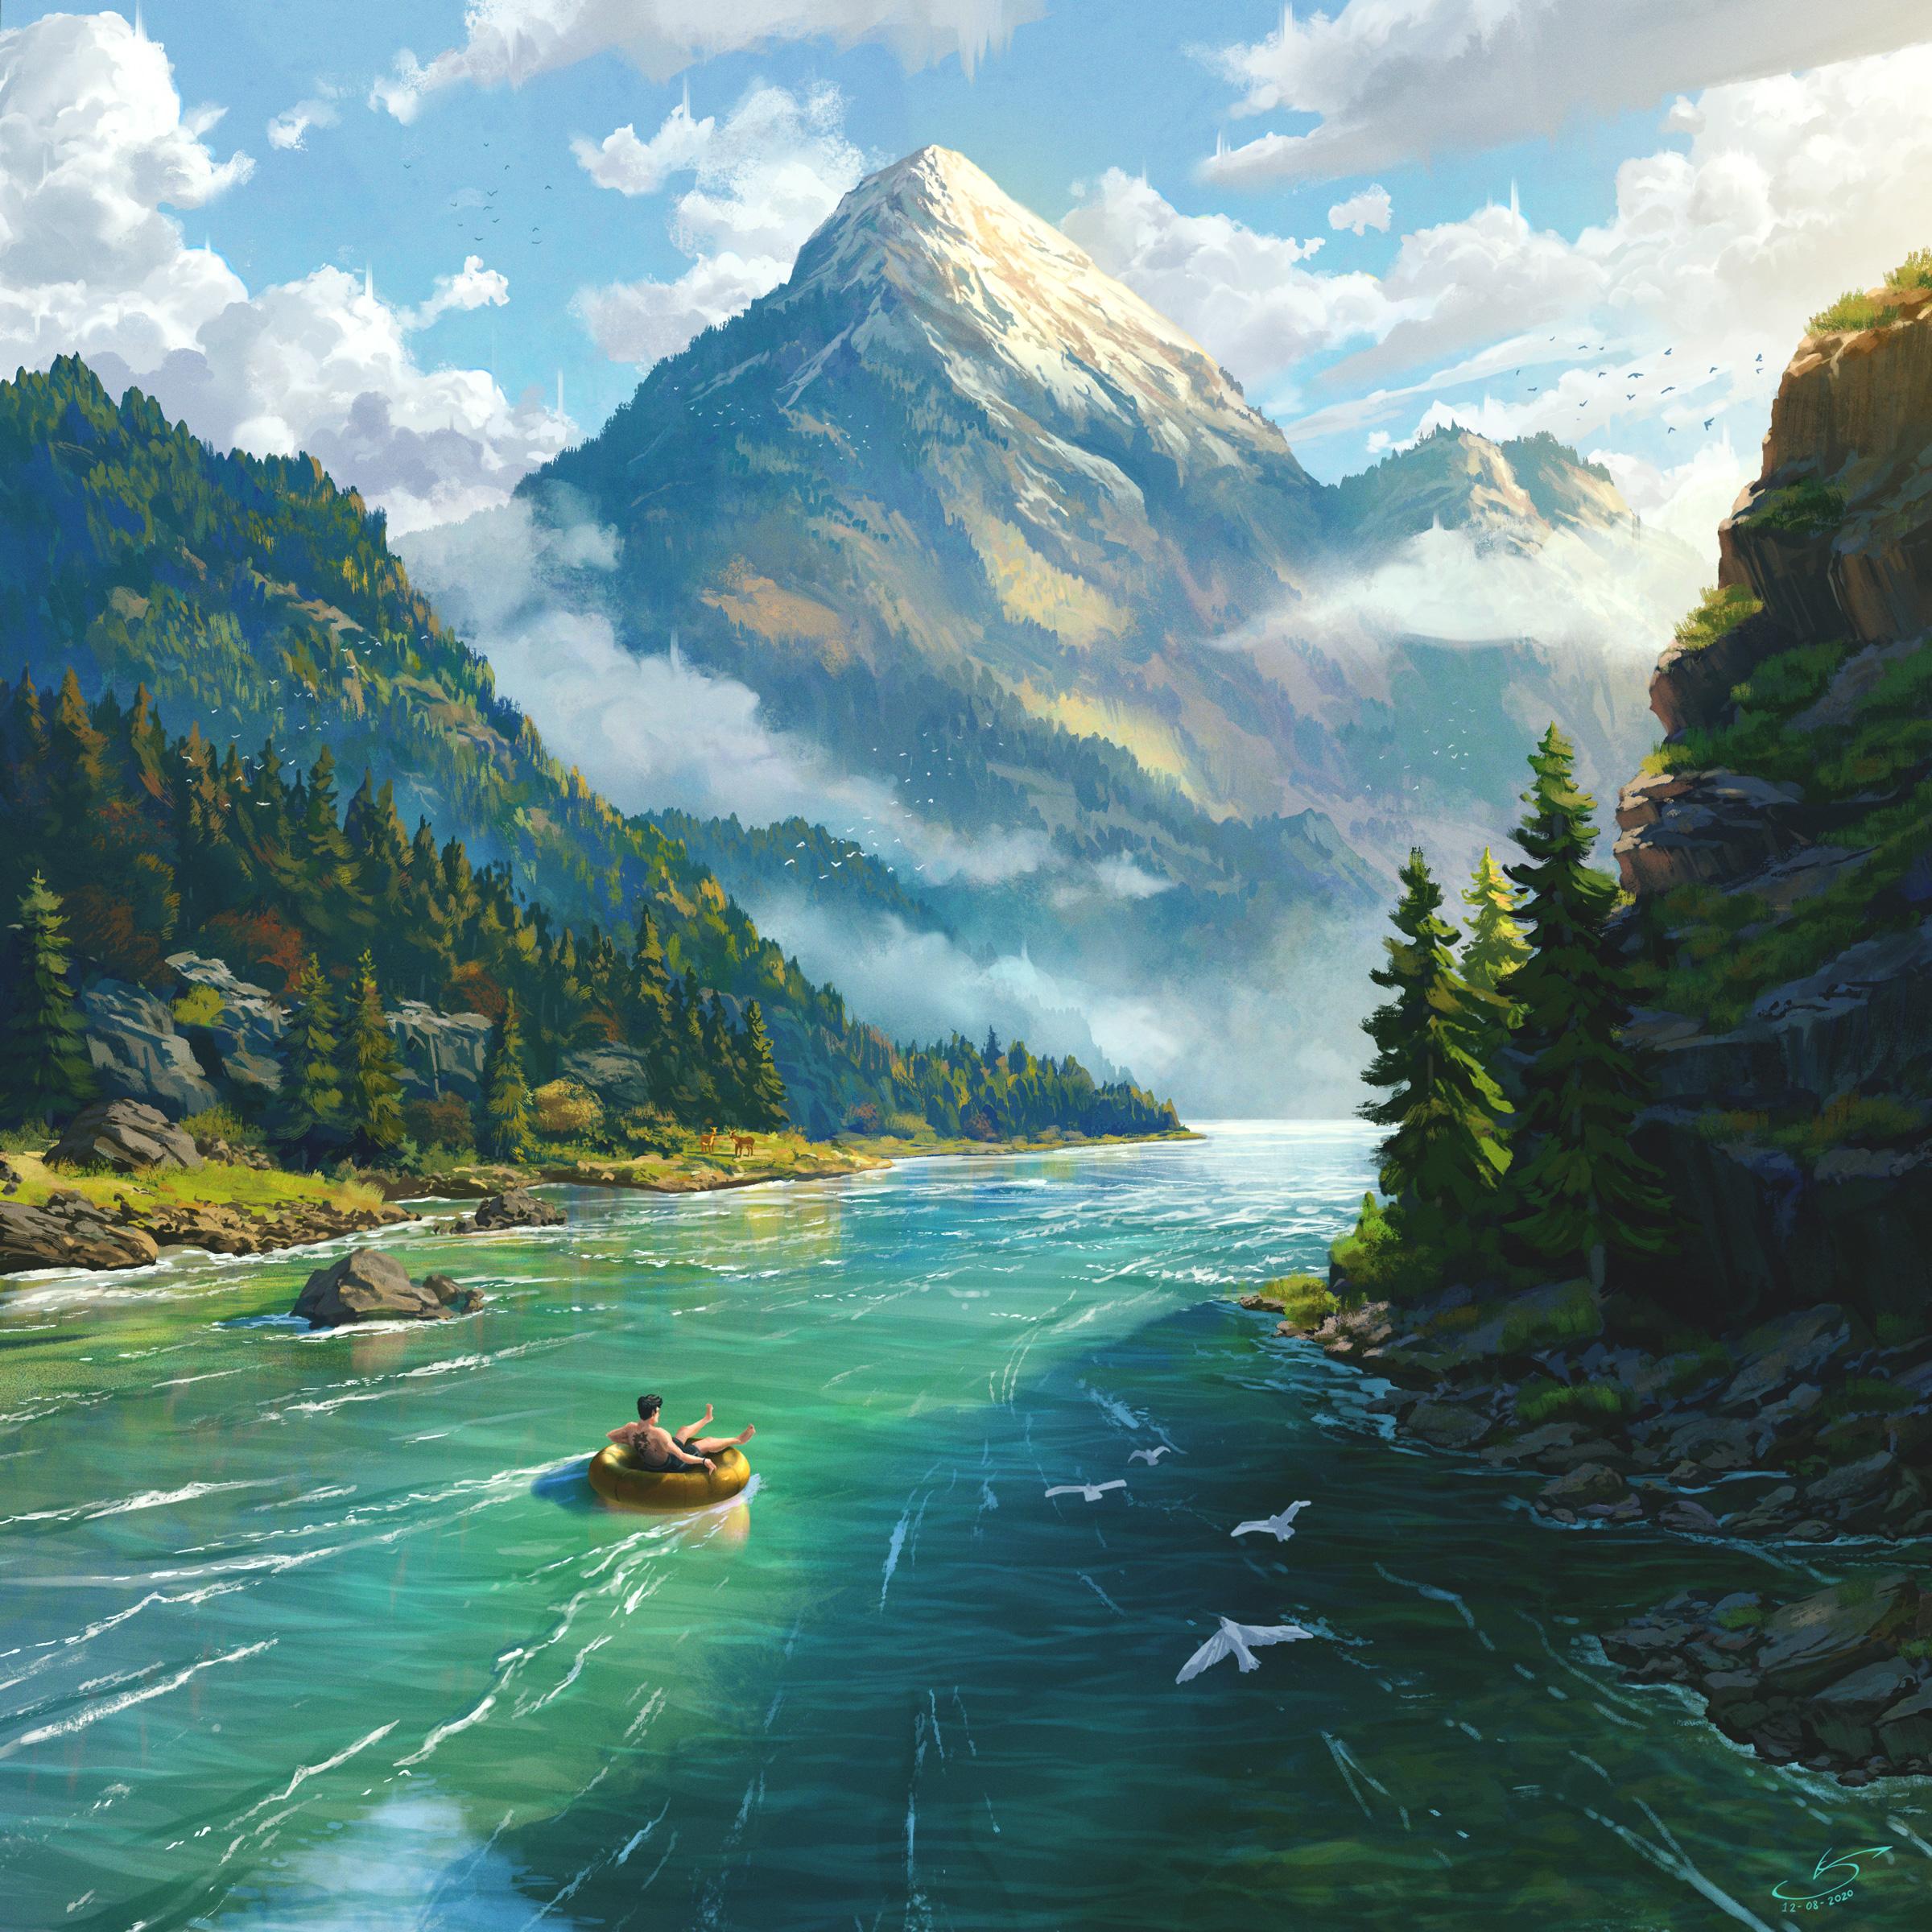 General 2400x2400 digital art landscape river mountains